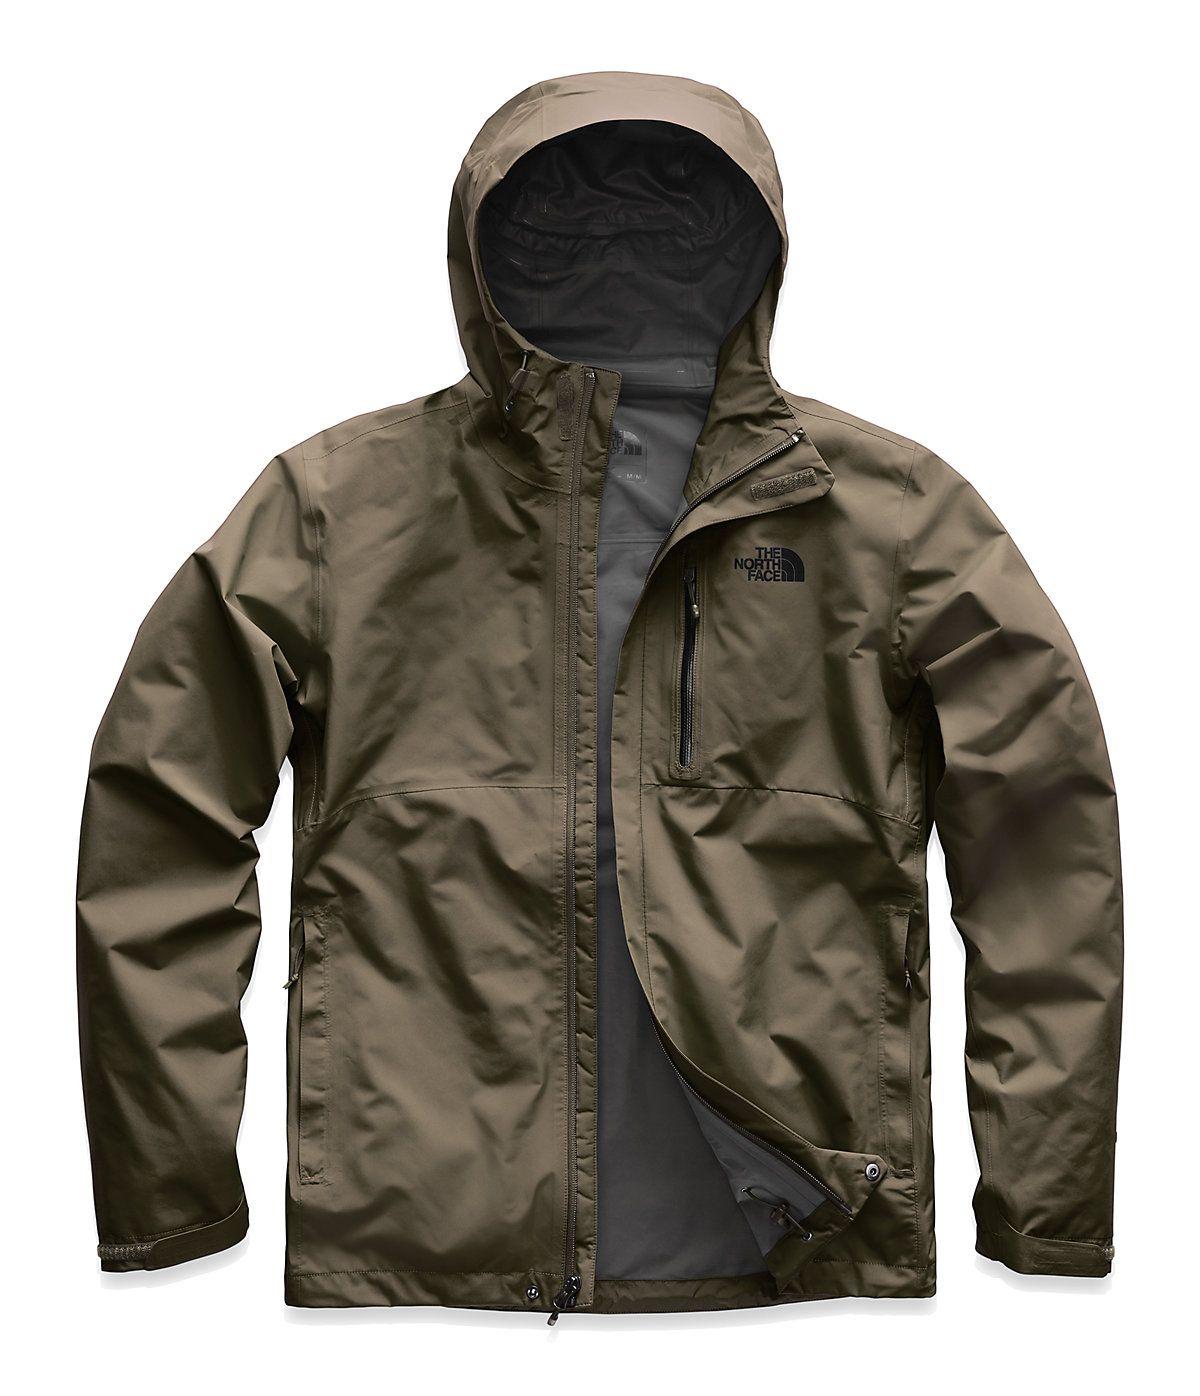 Men S Dryzzle Futurelight Jacket The North Face In 2021 North Face Mens Jackets The North Face [ 1396 x 1200 Pixel ]